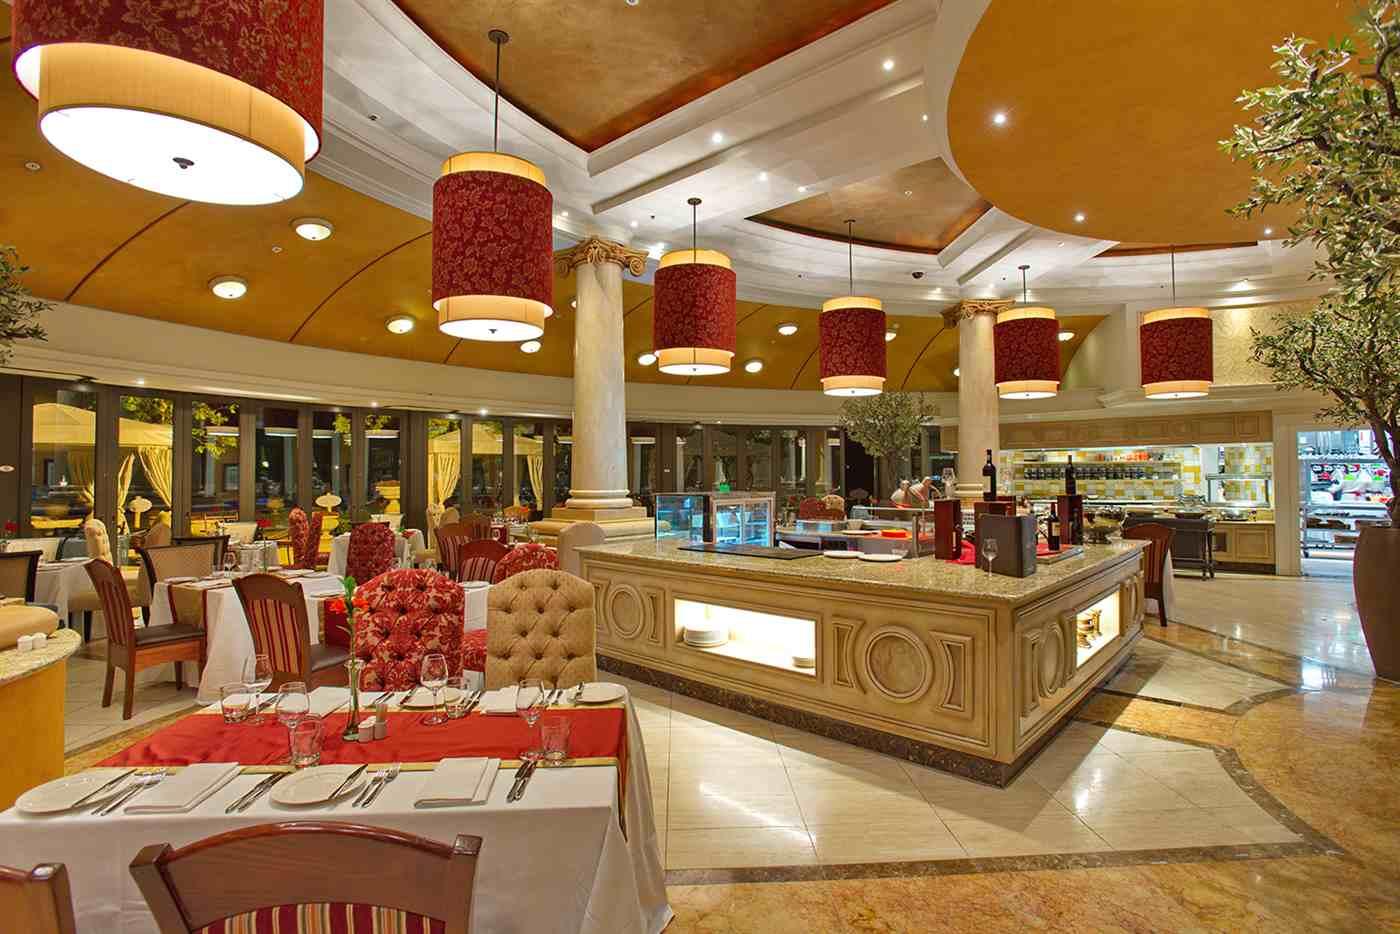 Emperors palace casino restaurants poker player millionaire